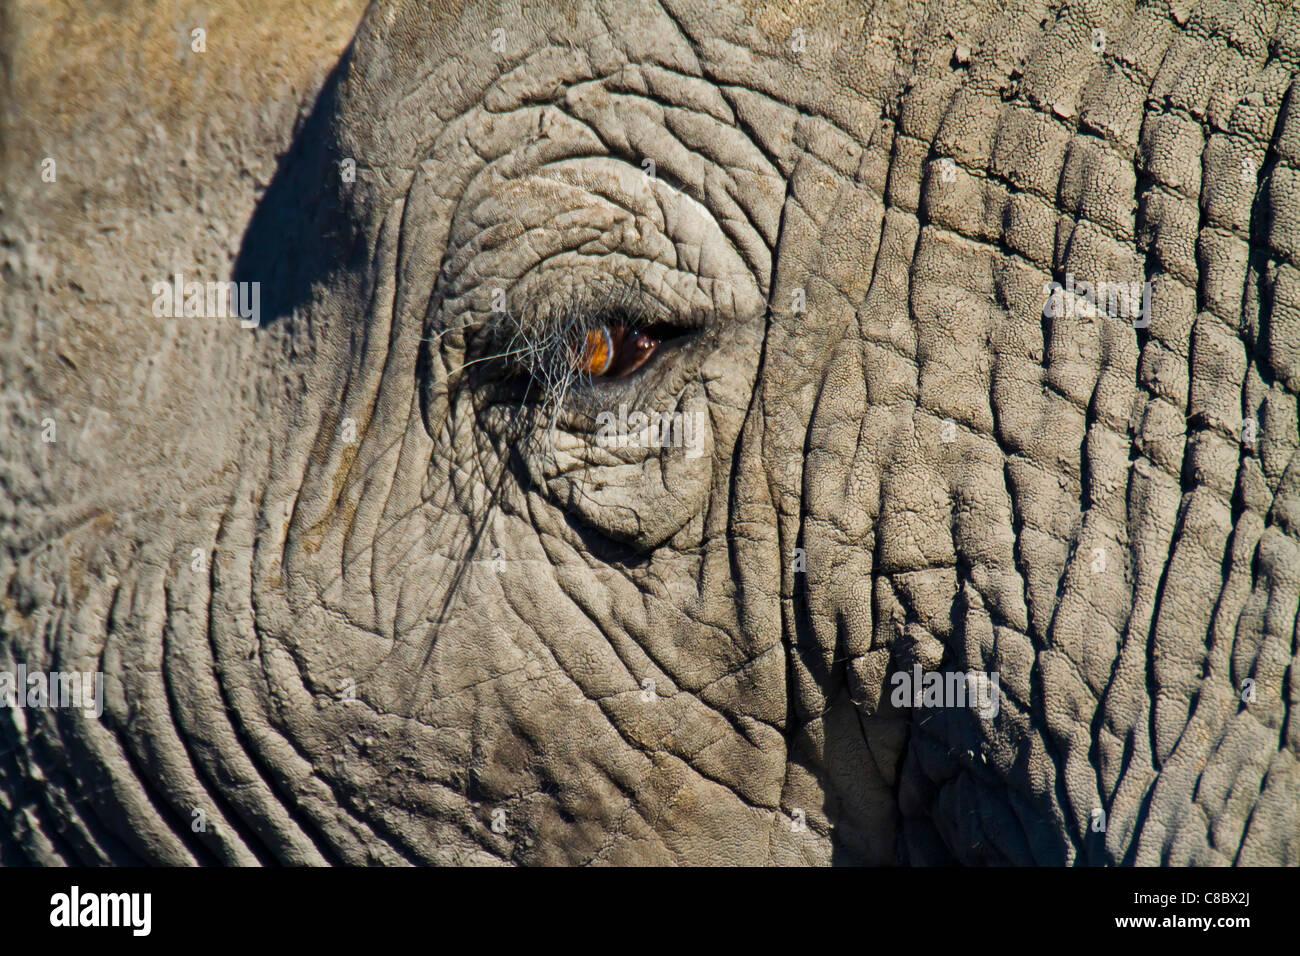 Elephant eye, il Parco Nazionale di Hwange, Zimbabwe Immagini Stock